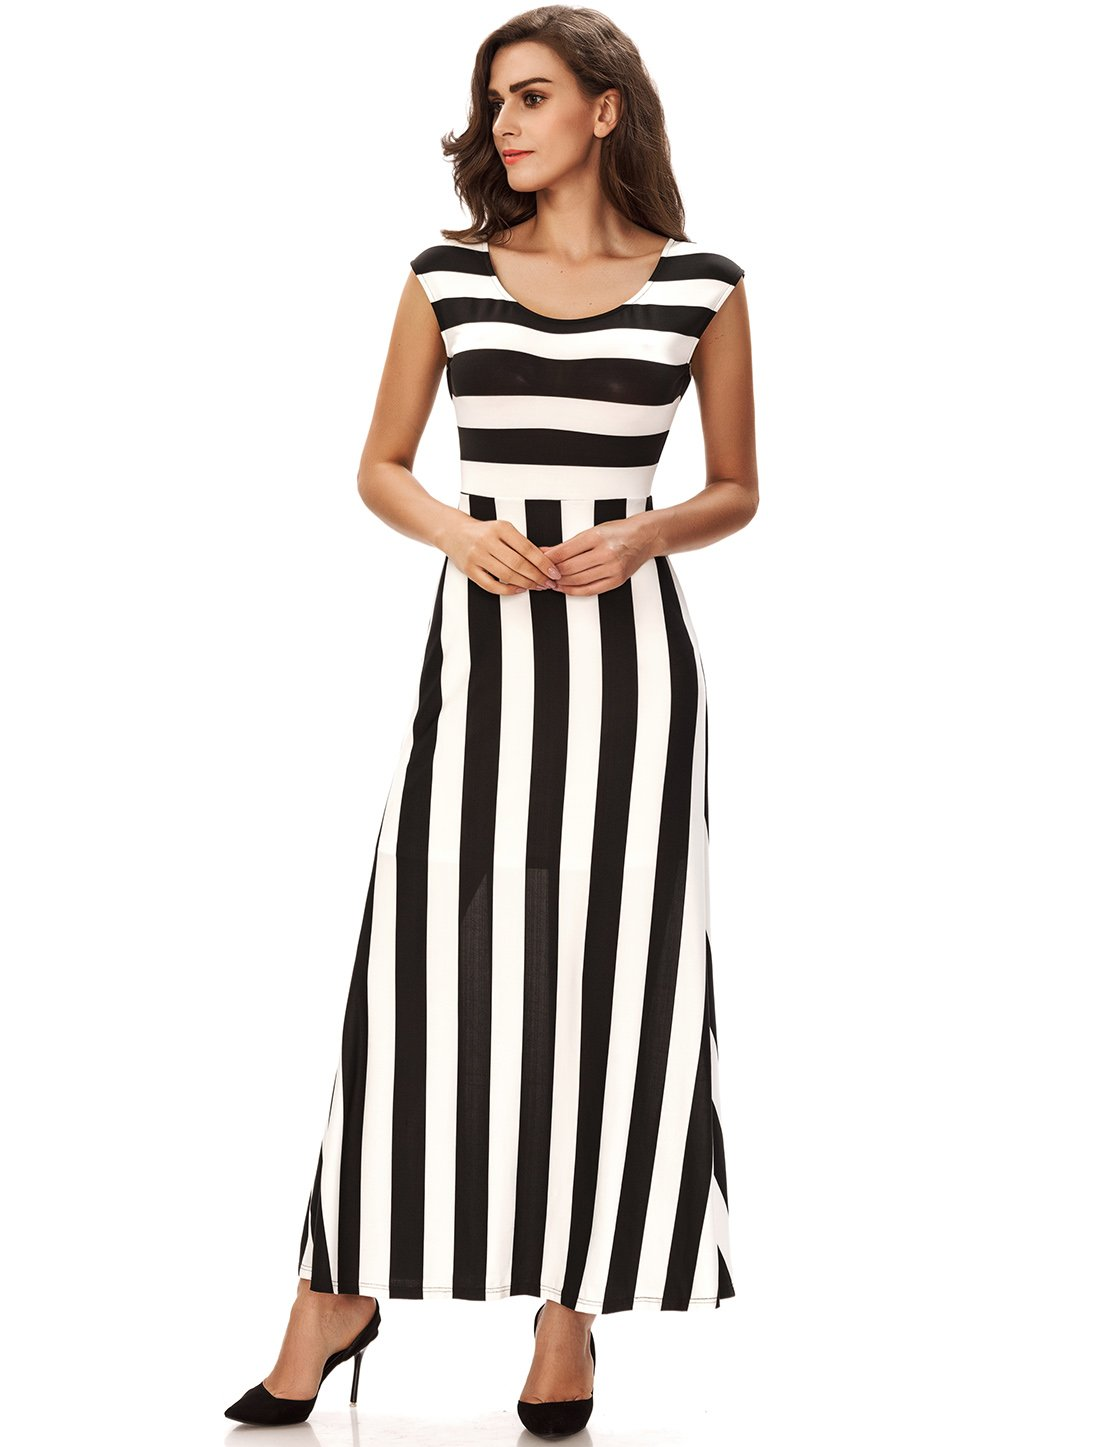 Noctflos Women's Elegant Vertical Striped Long Party Dress Tank Maxi Dress